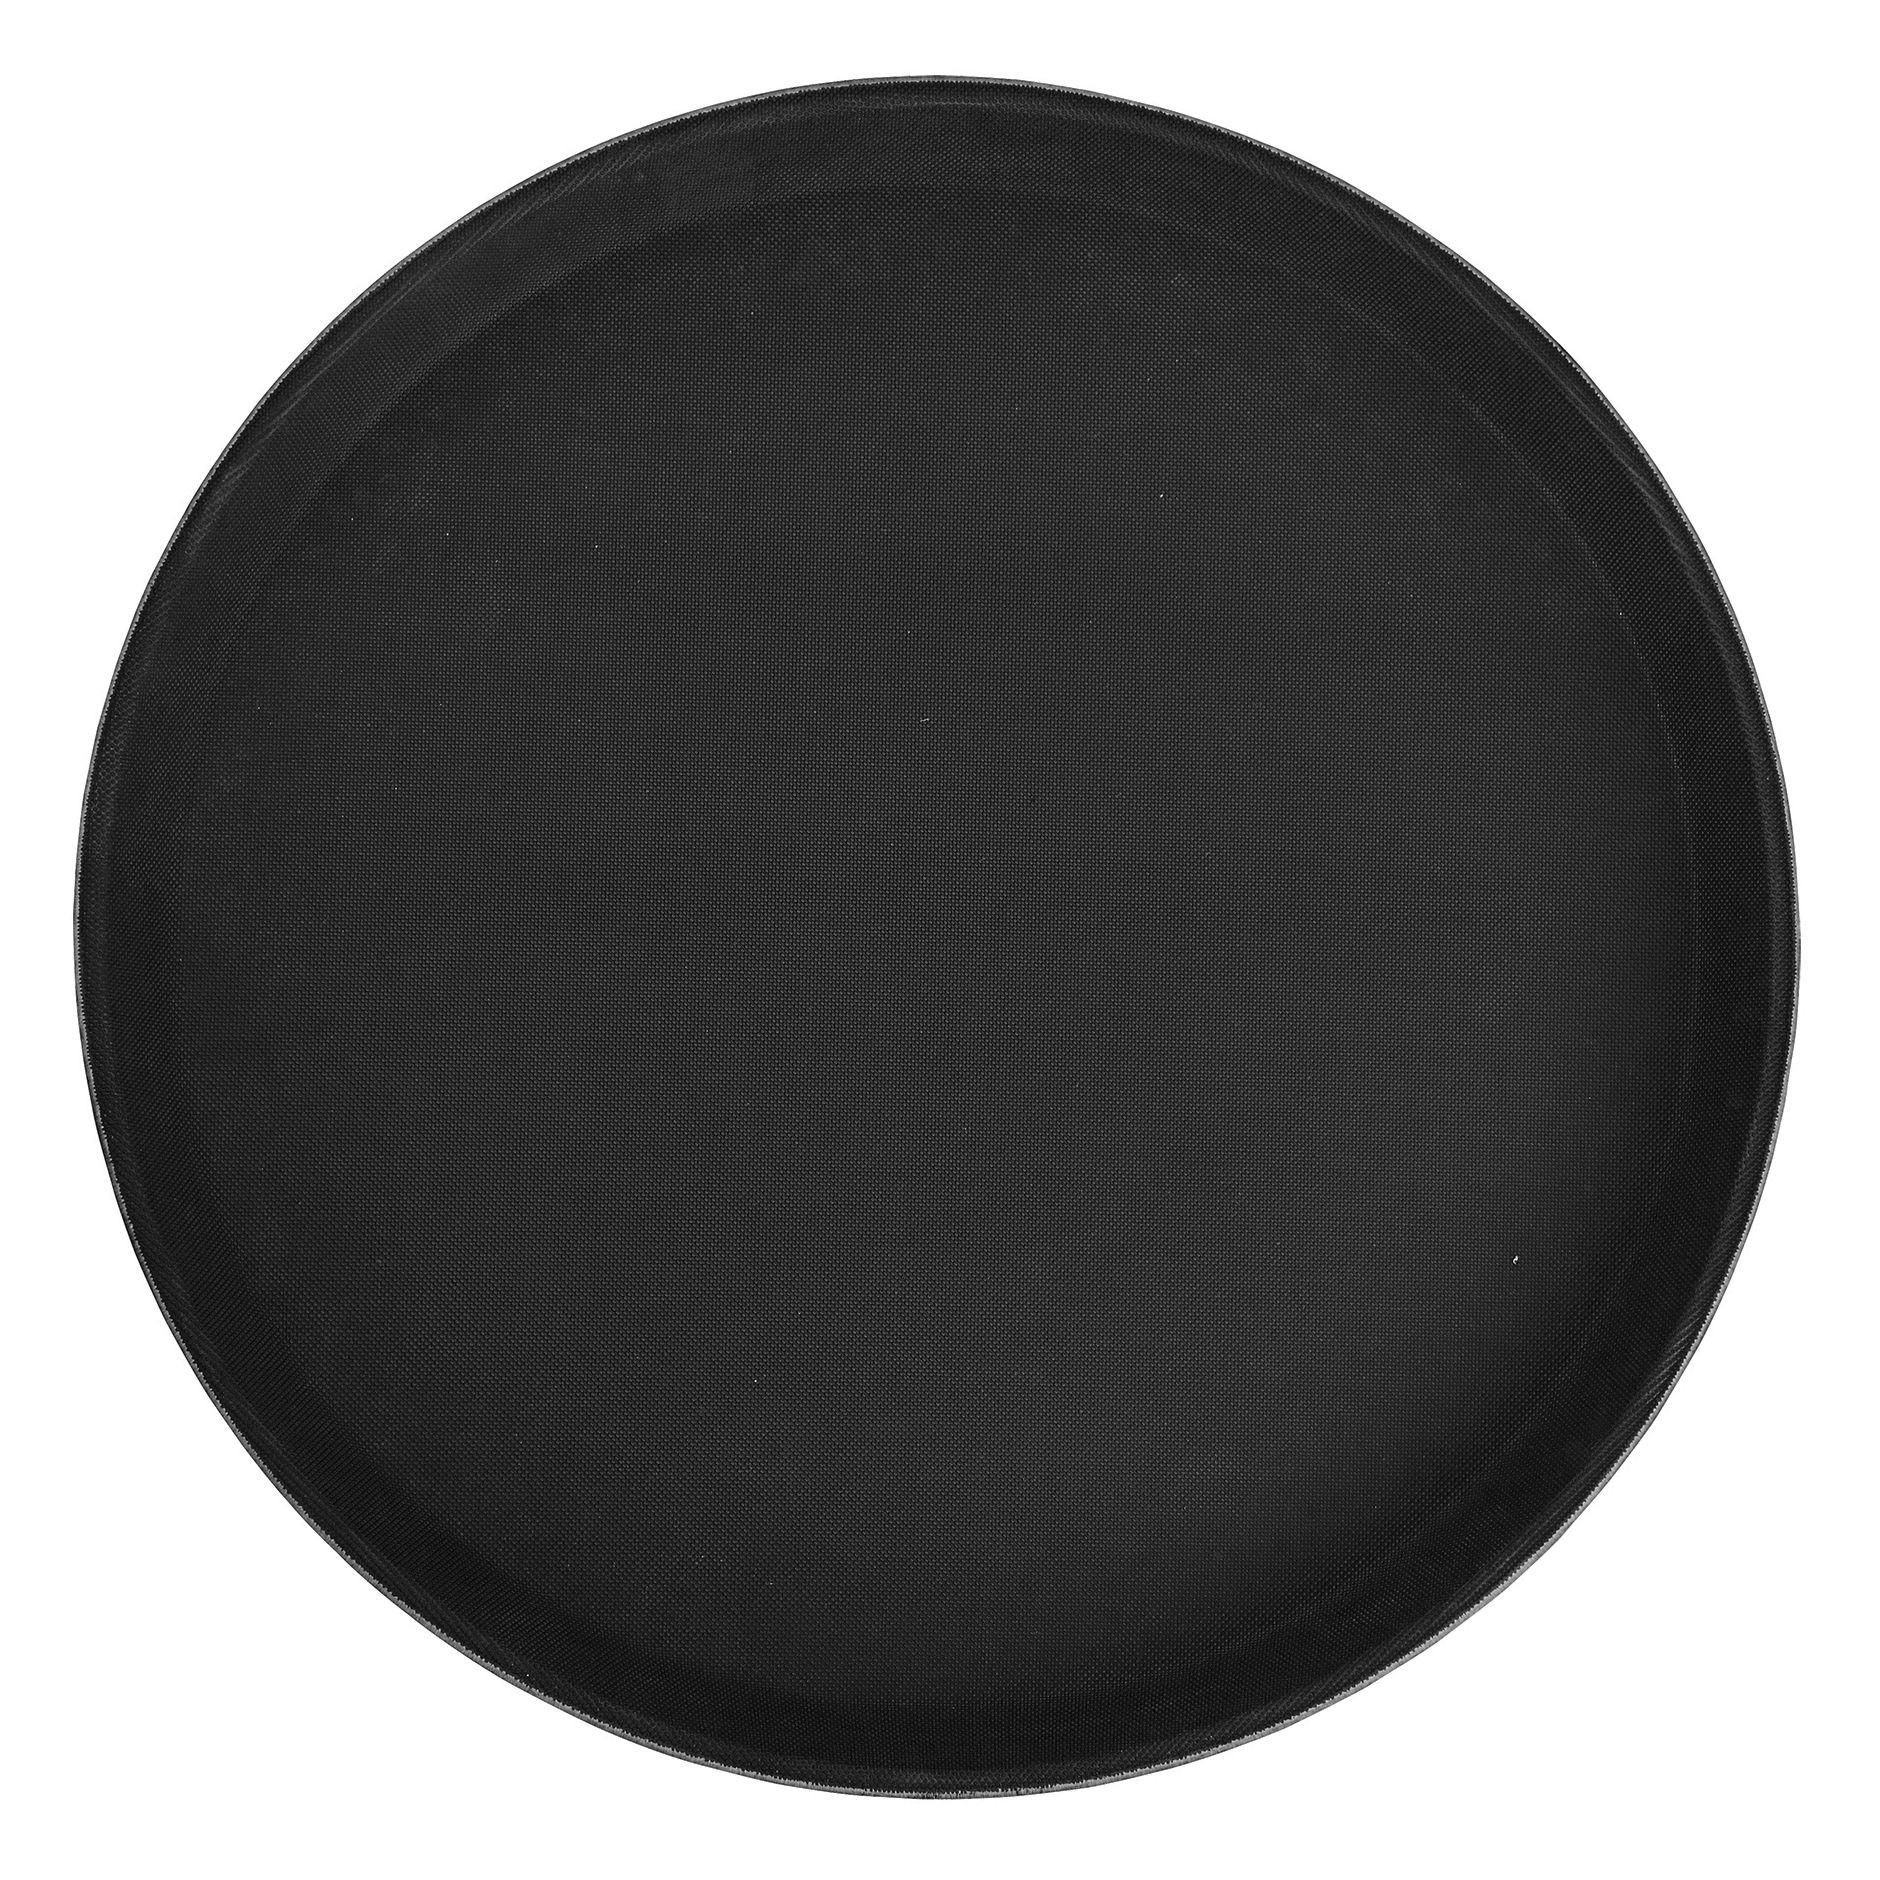 "Winco TFG-11K Round Black Non-Slip Fiberglass Tray 11"""